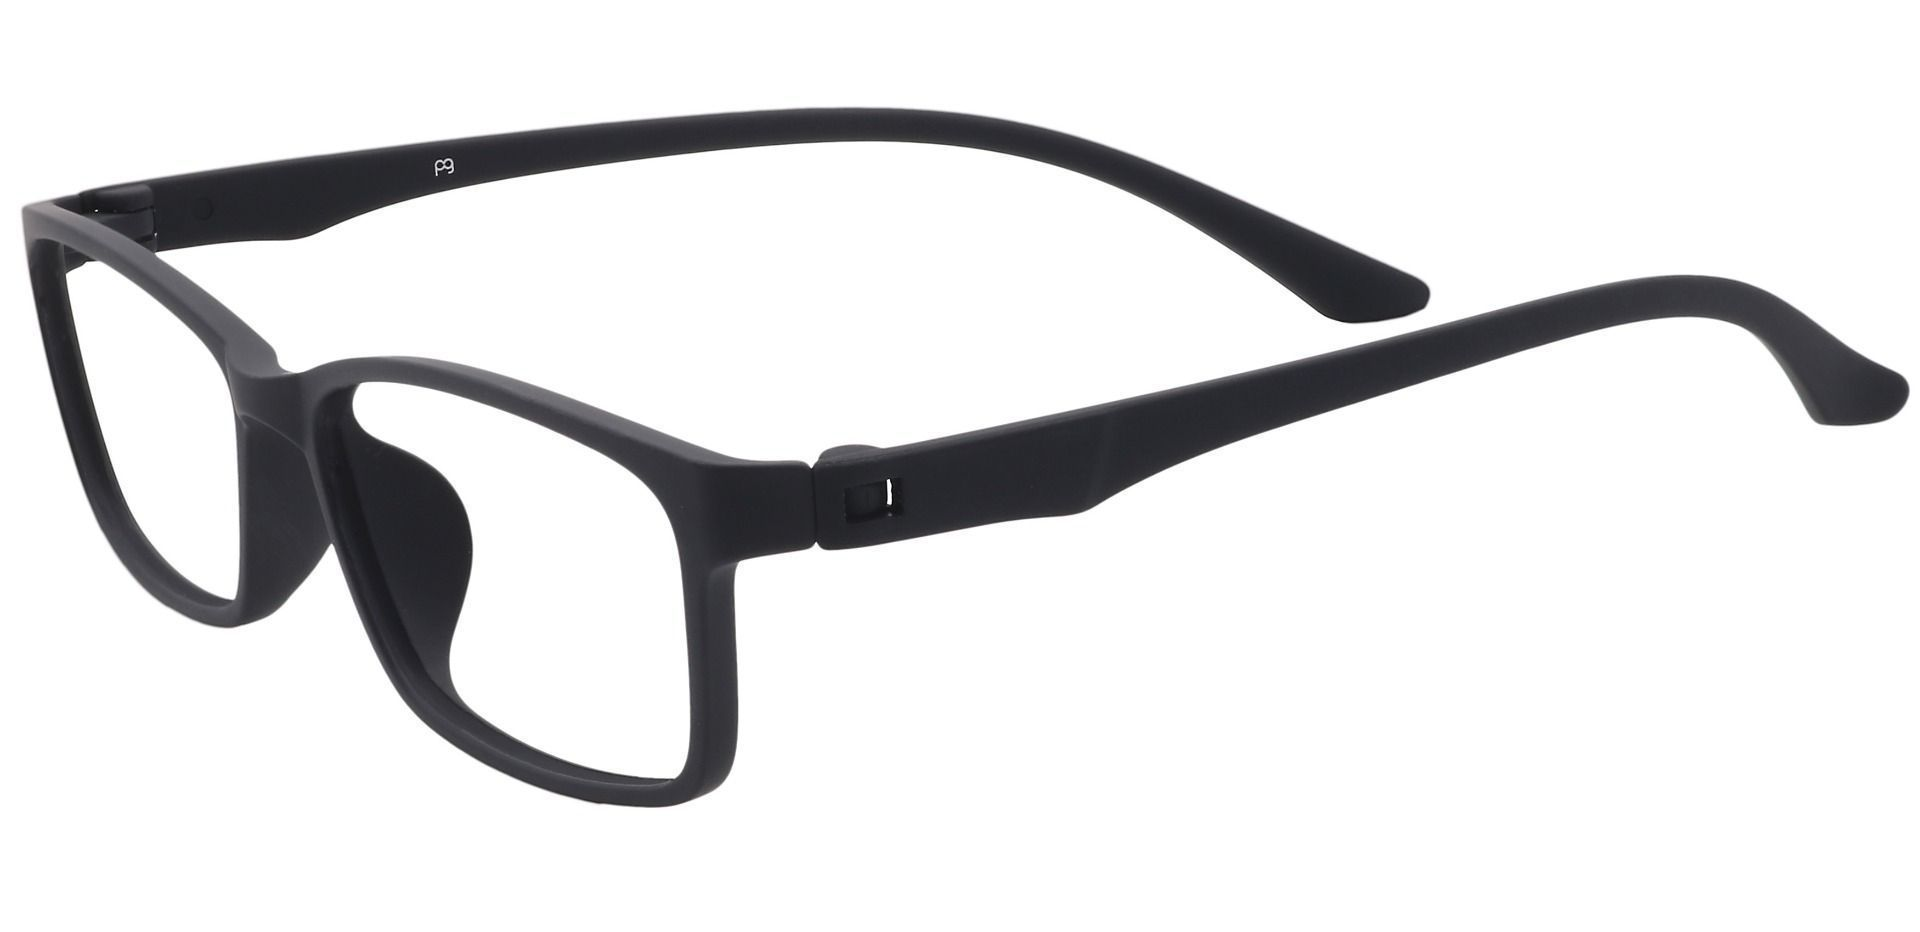 Wichita Rectangle Eyeglasses Frame -  Matte Black